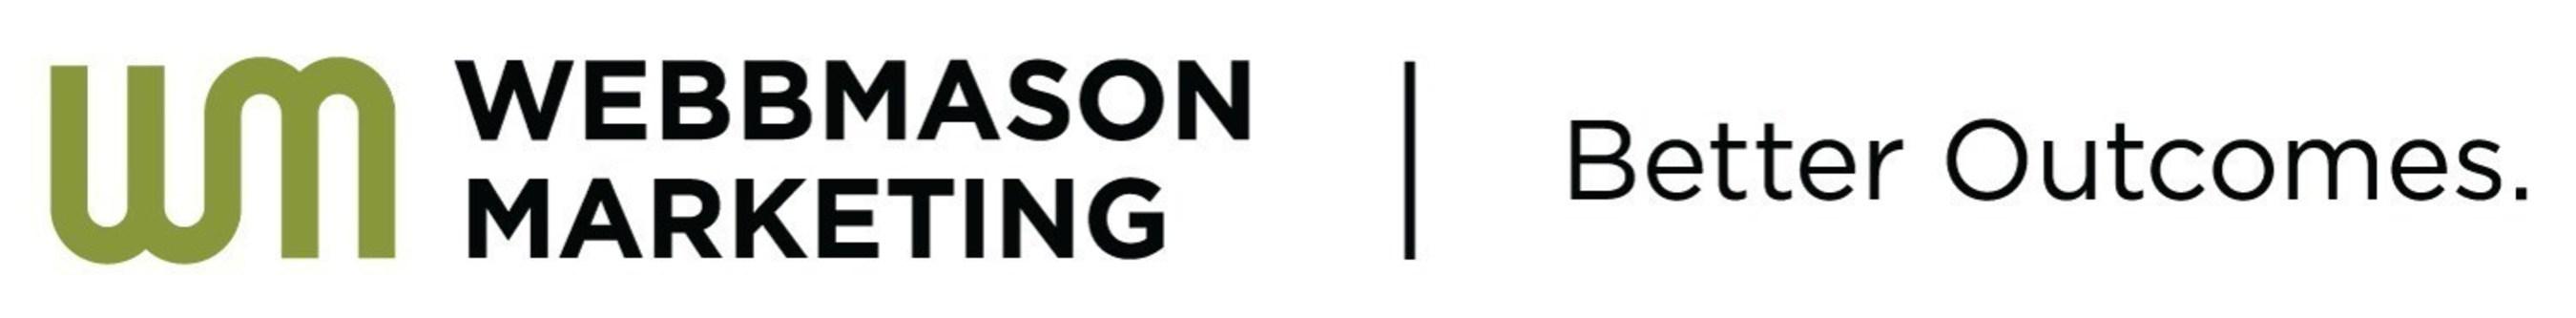 WebbMason Marketing provides full service marketing to over 500 companies and organizations. Everything we do ...